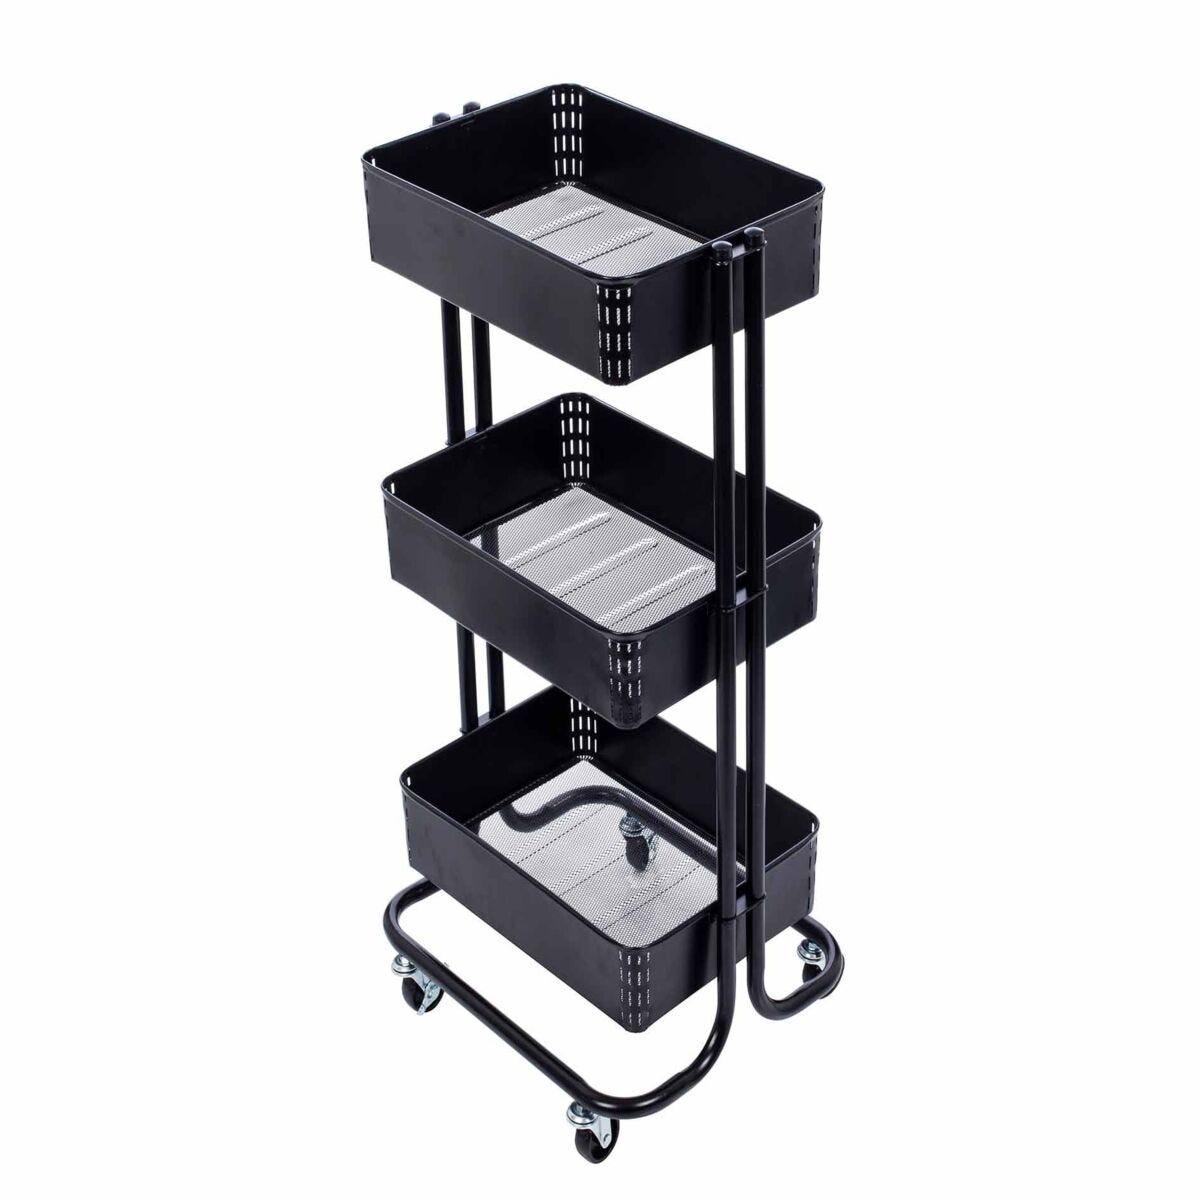 Ryman 3 Tier Storage Trolley